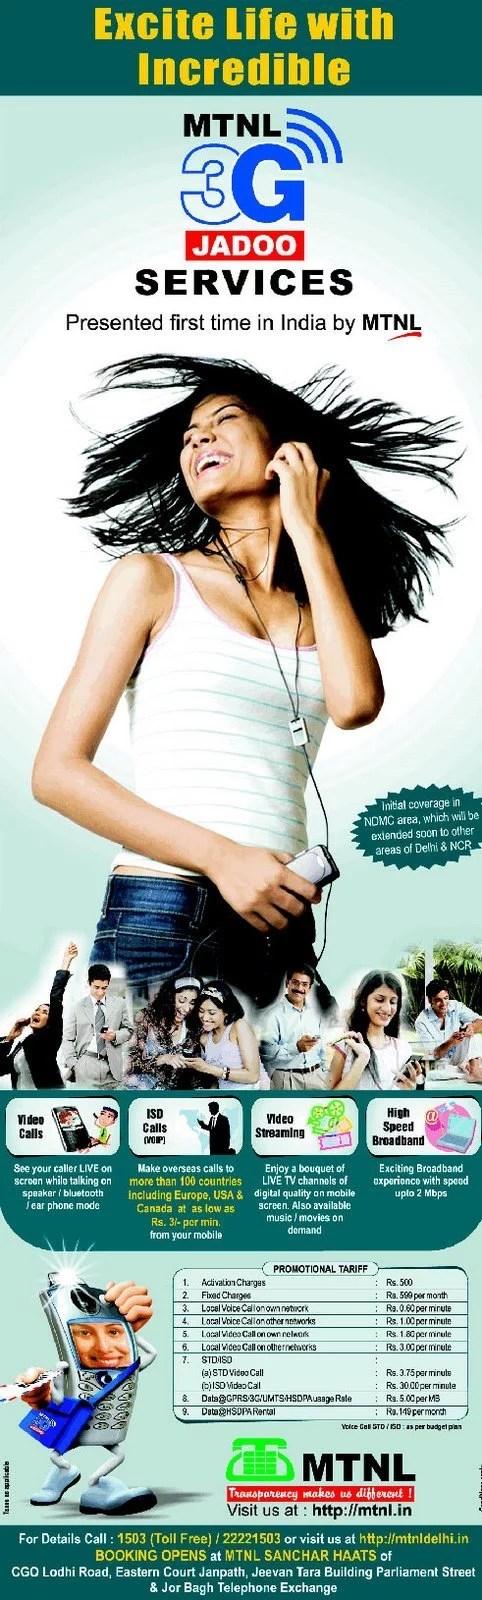 MTNL Jadoo 3G